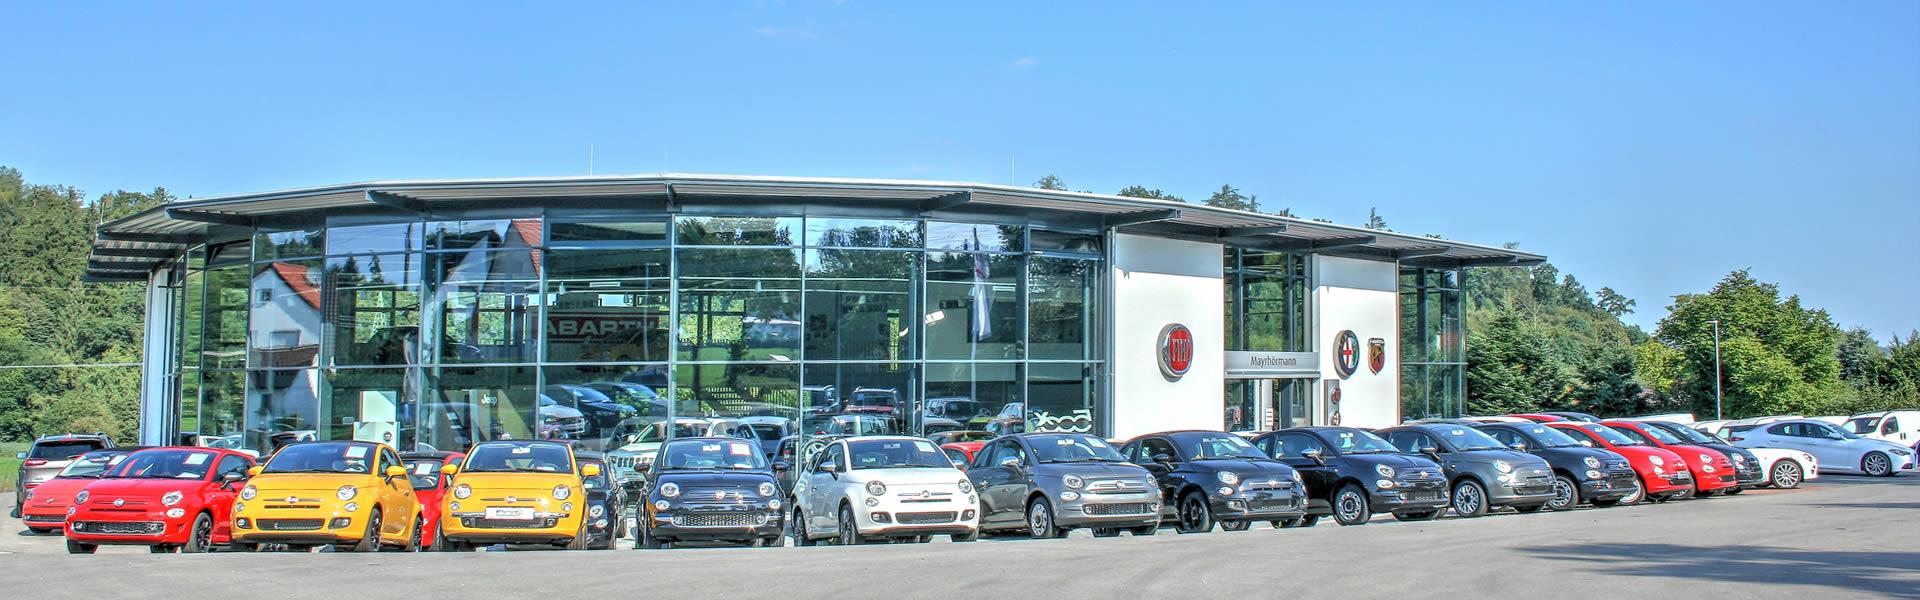 Showroom Autohaus Mayrhoermann Gmbh | Diedorf/Biburg